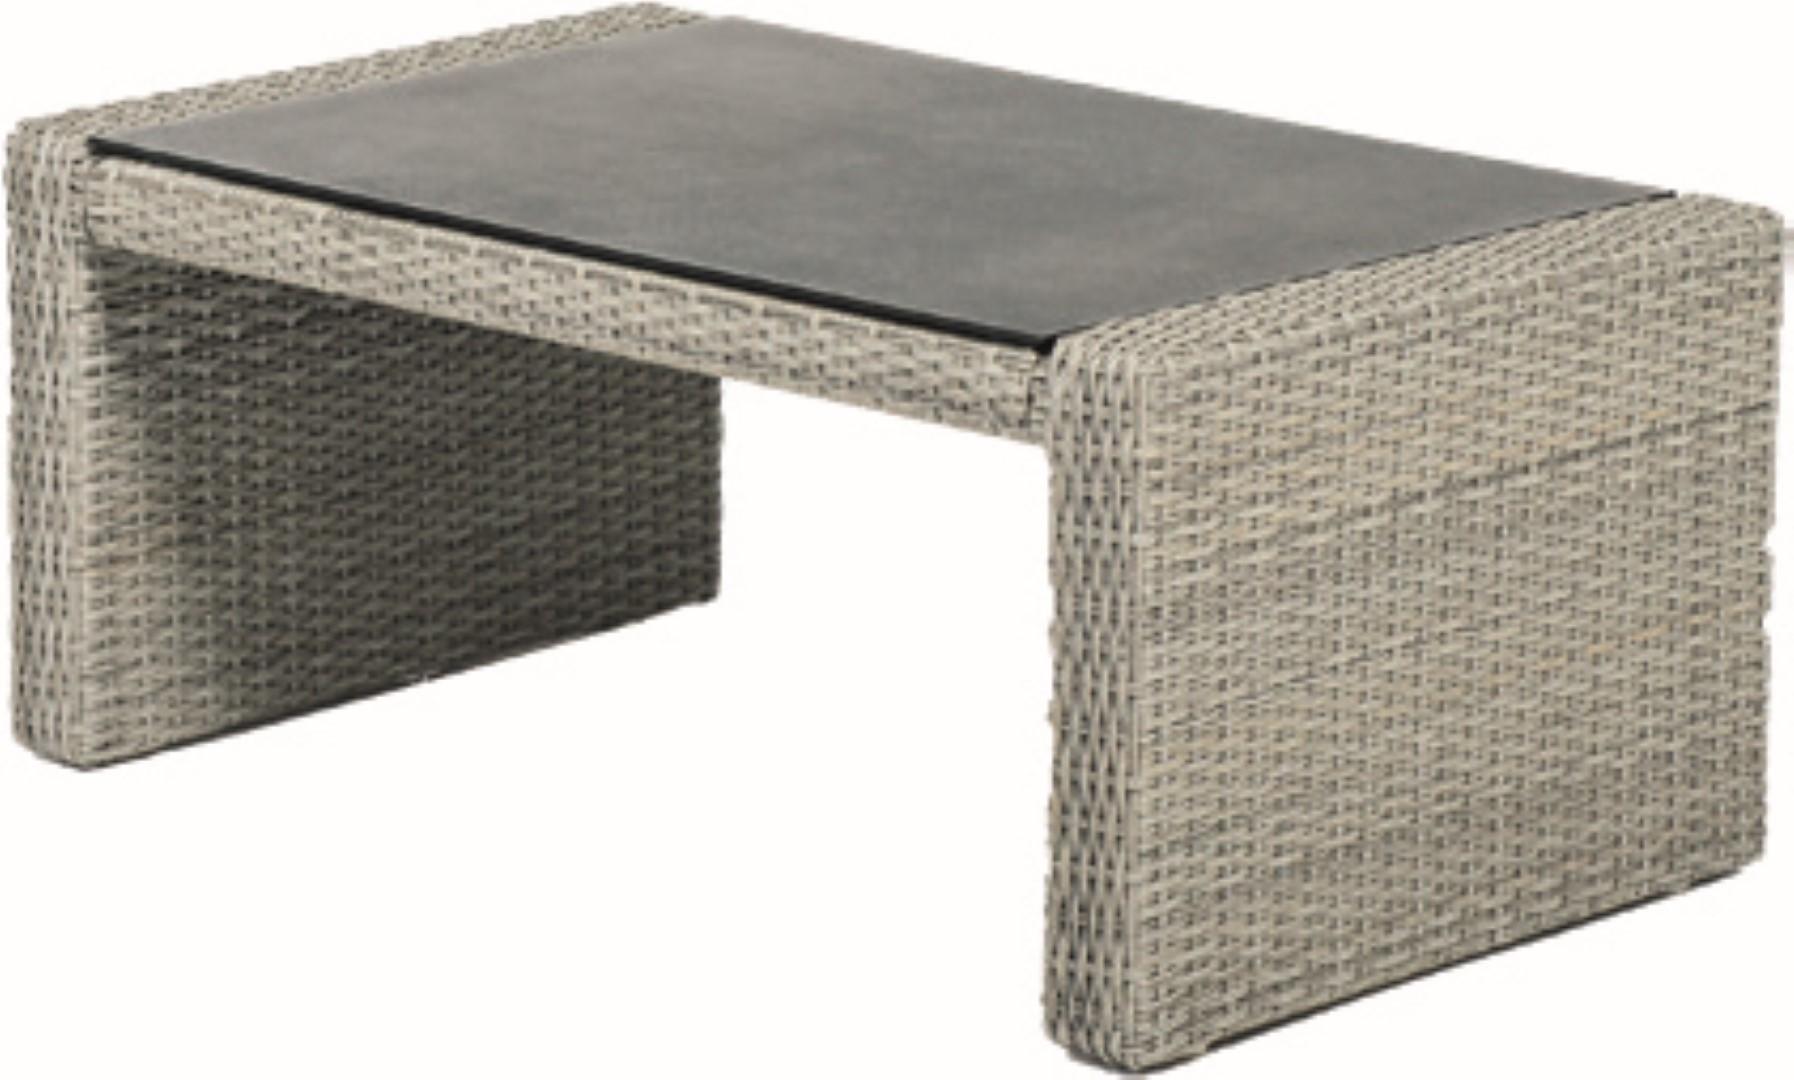 Barcelona Lounge Table